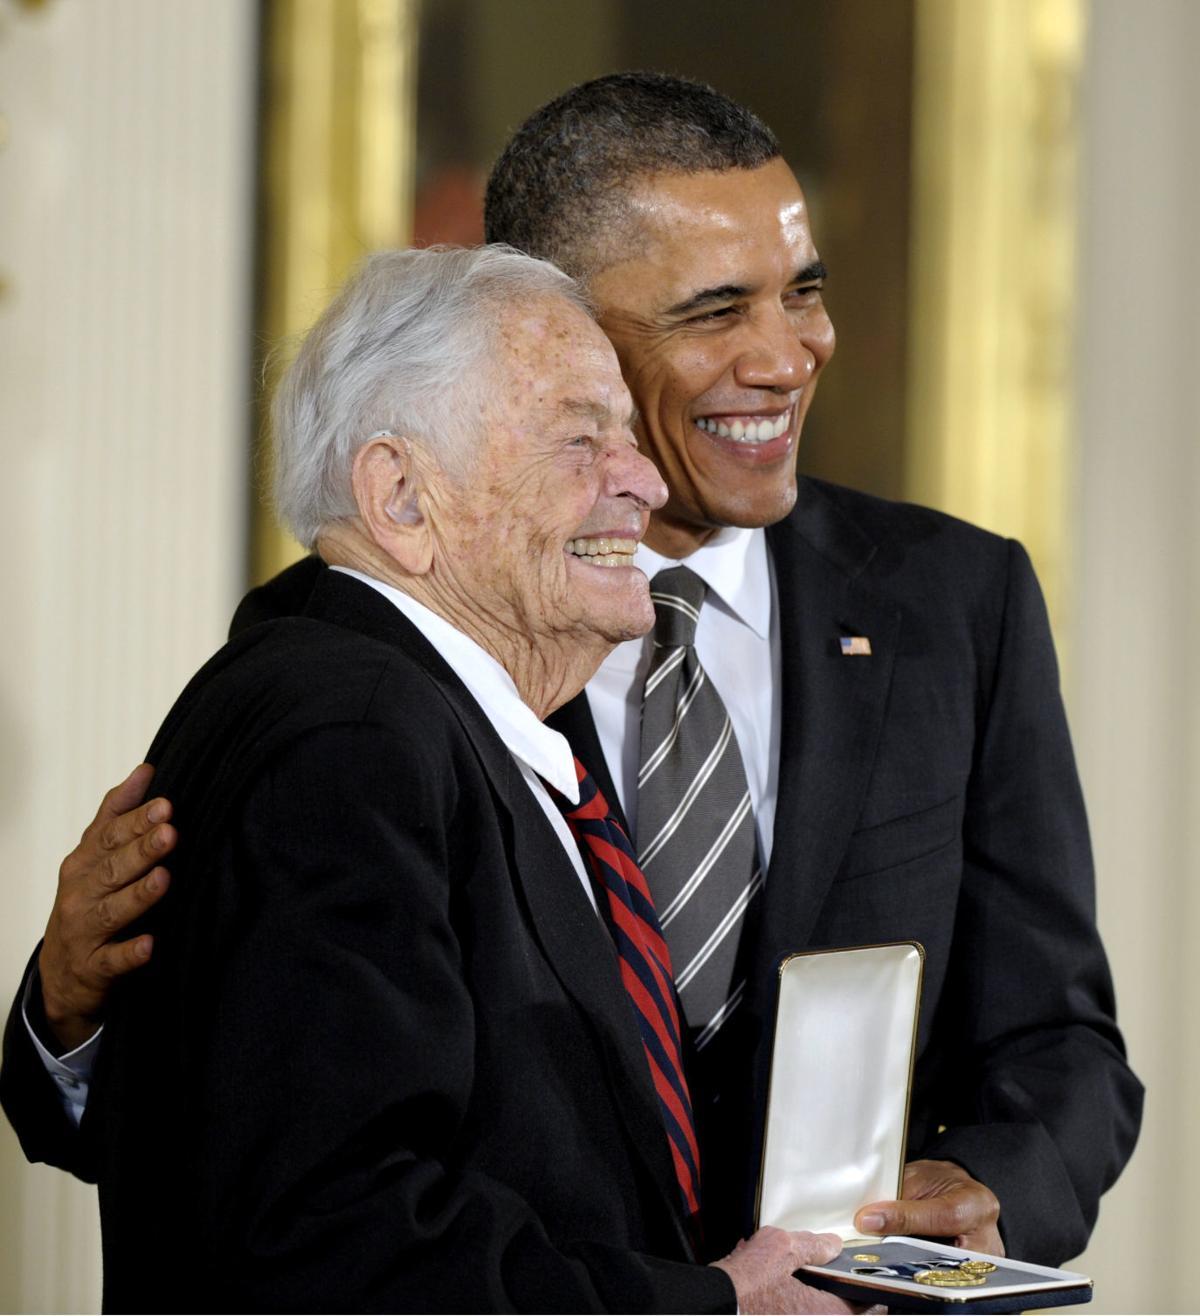 Barack Obama, T. Berry Brazelton